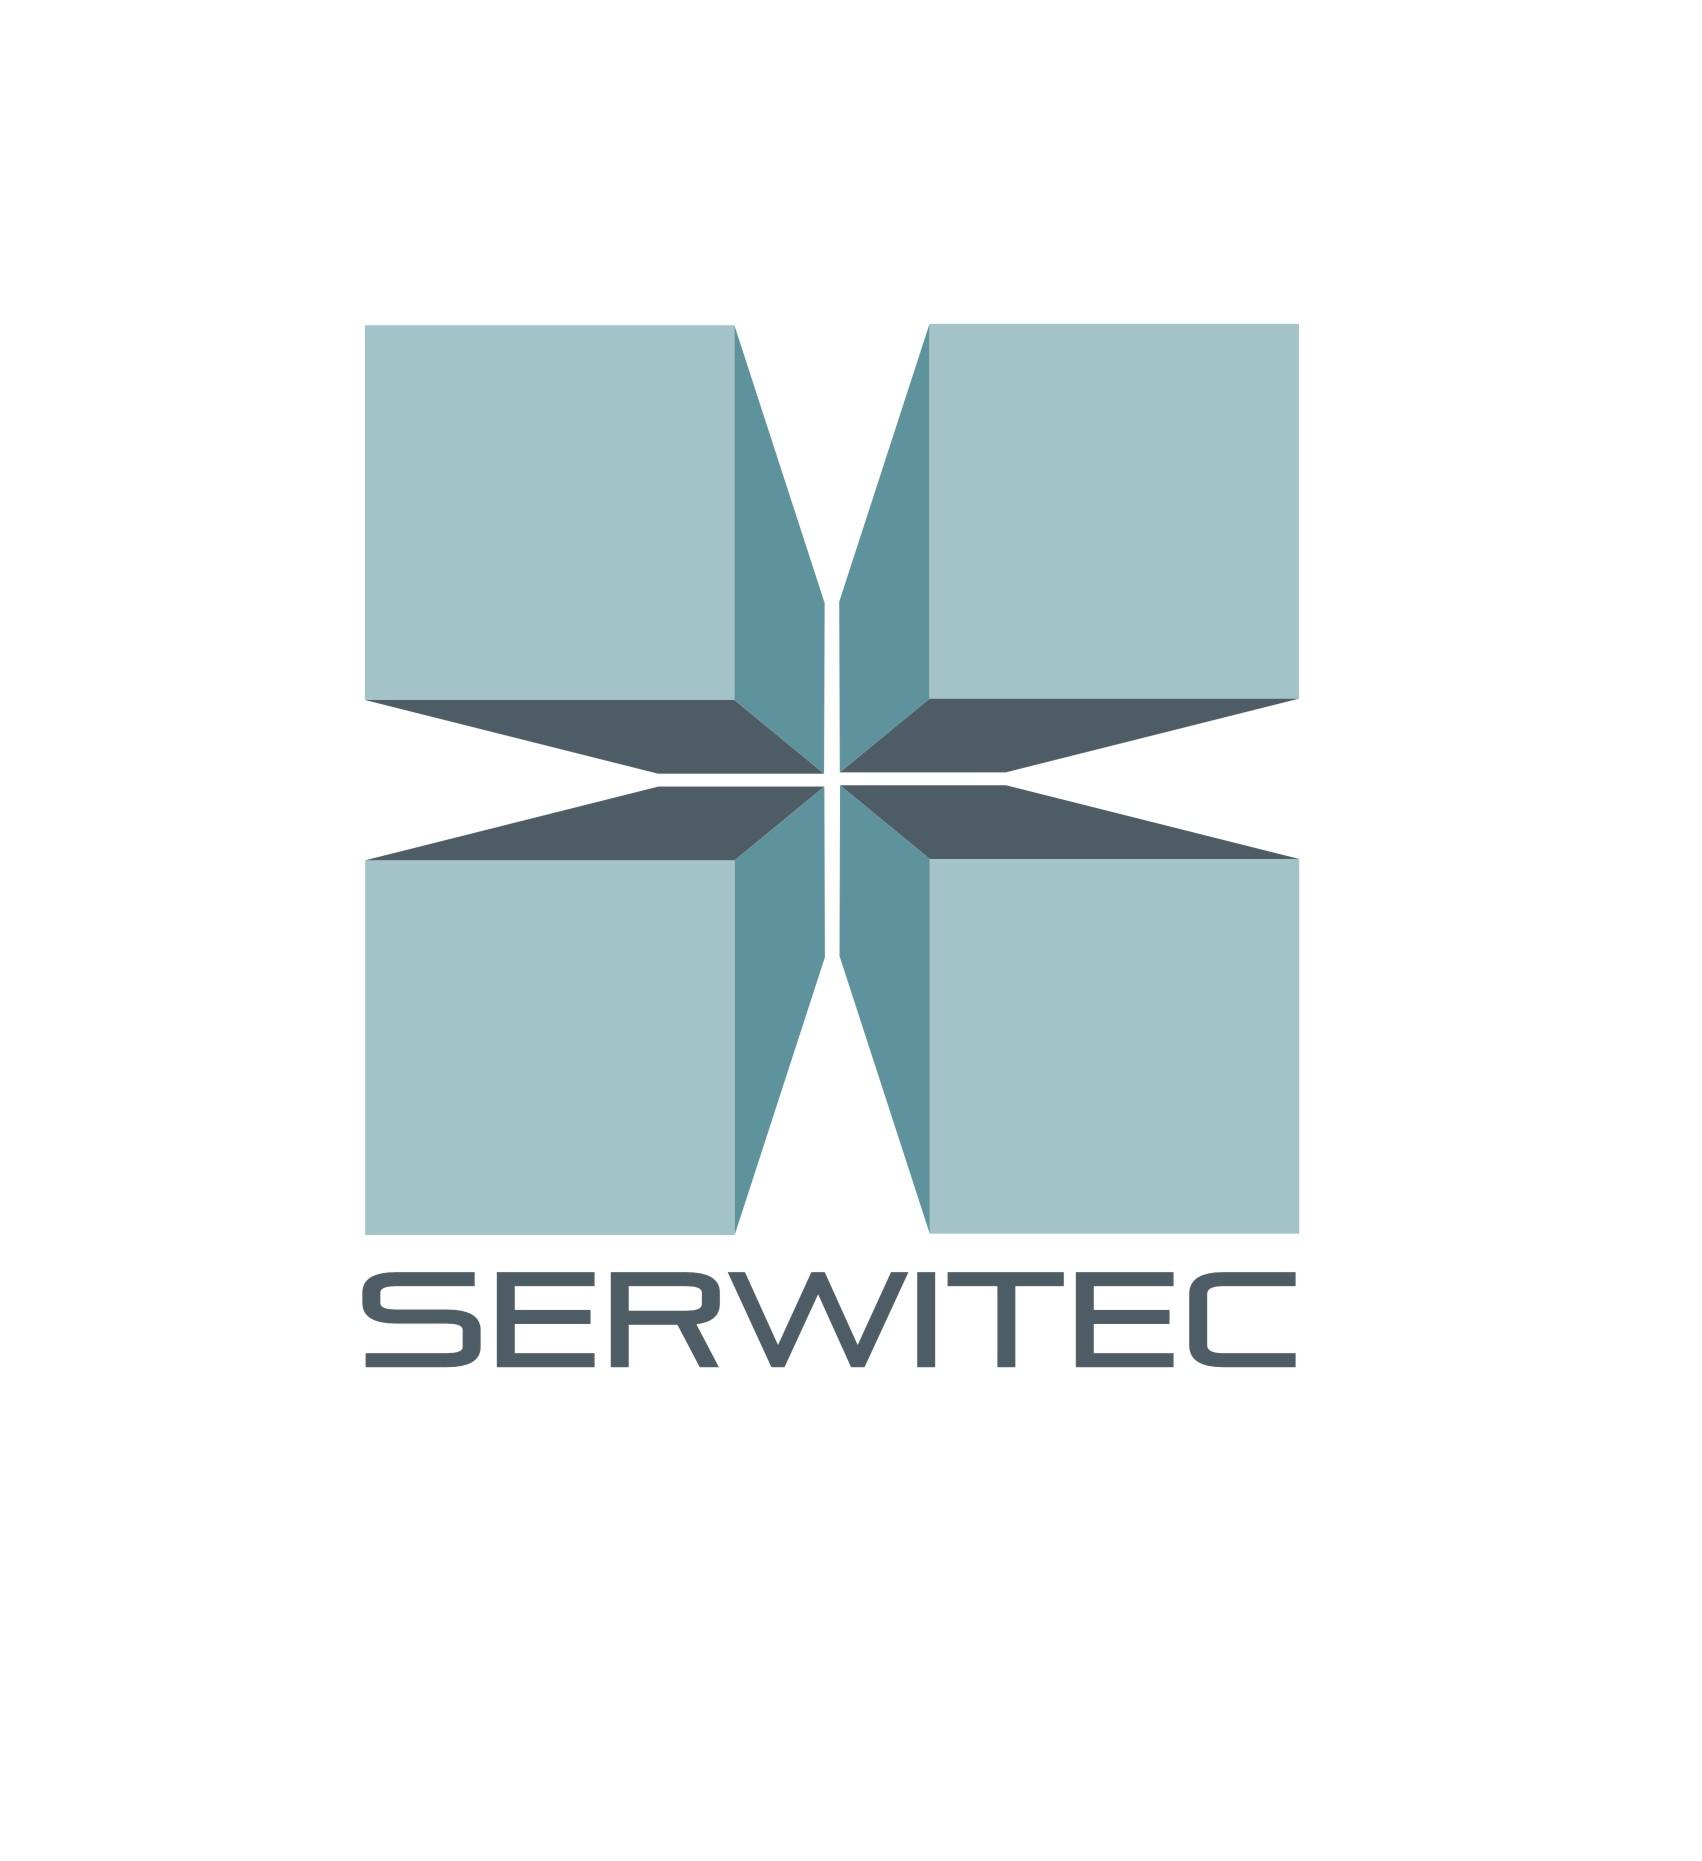 Serwitec logo